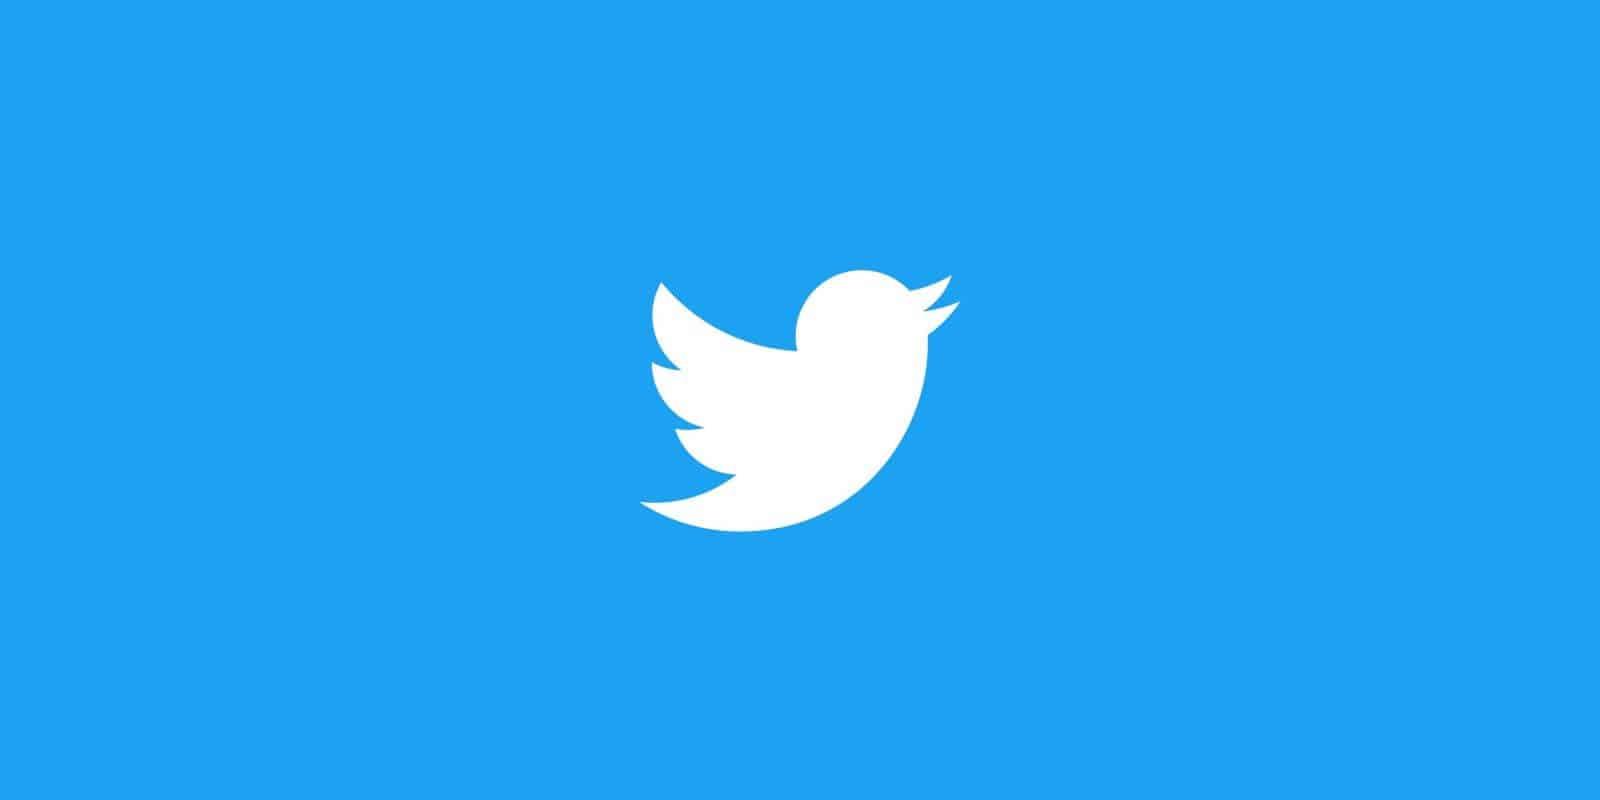 Twitter Logo - How to buy Twitter stock in 2020 | Learnbonds